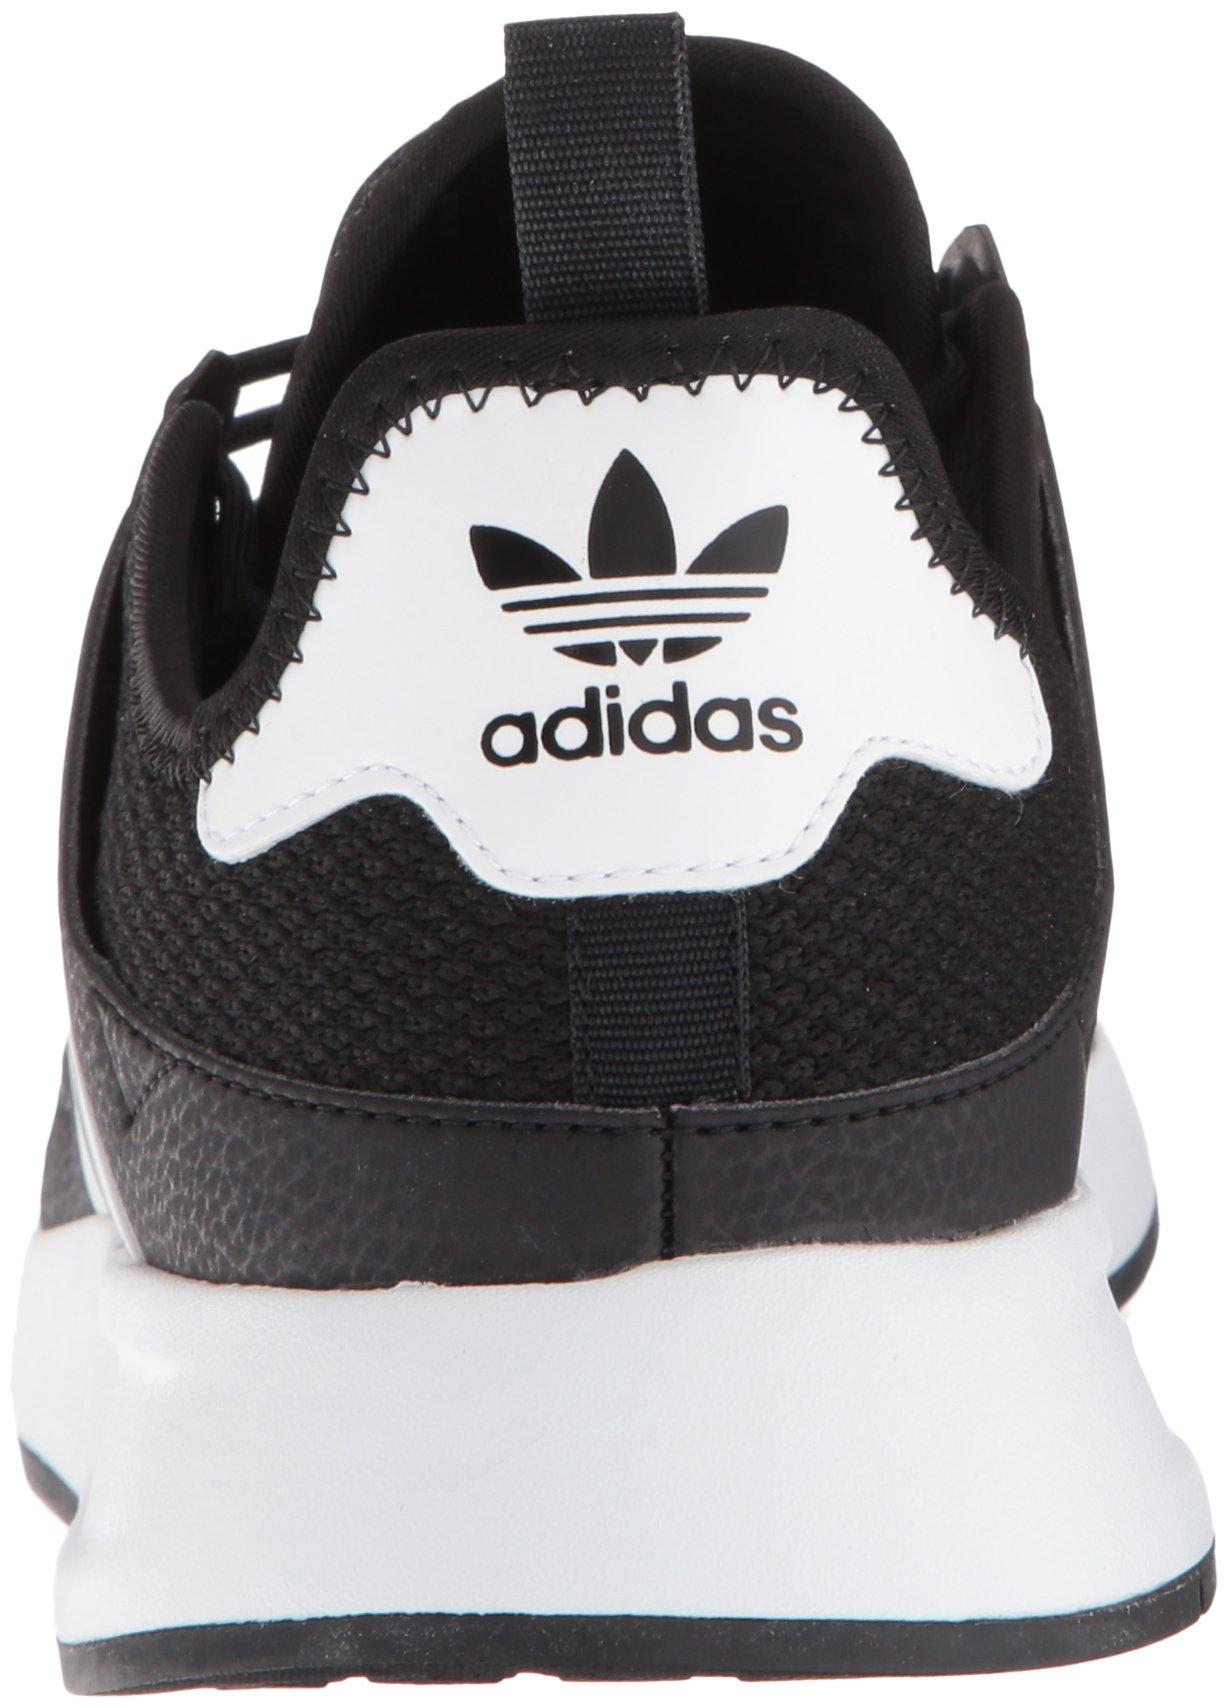 adidas Originals Mens X_PLR Running Shoe White/Black, 5 M US by adidas Originals (Image #2)